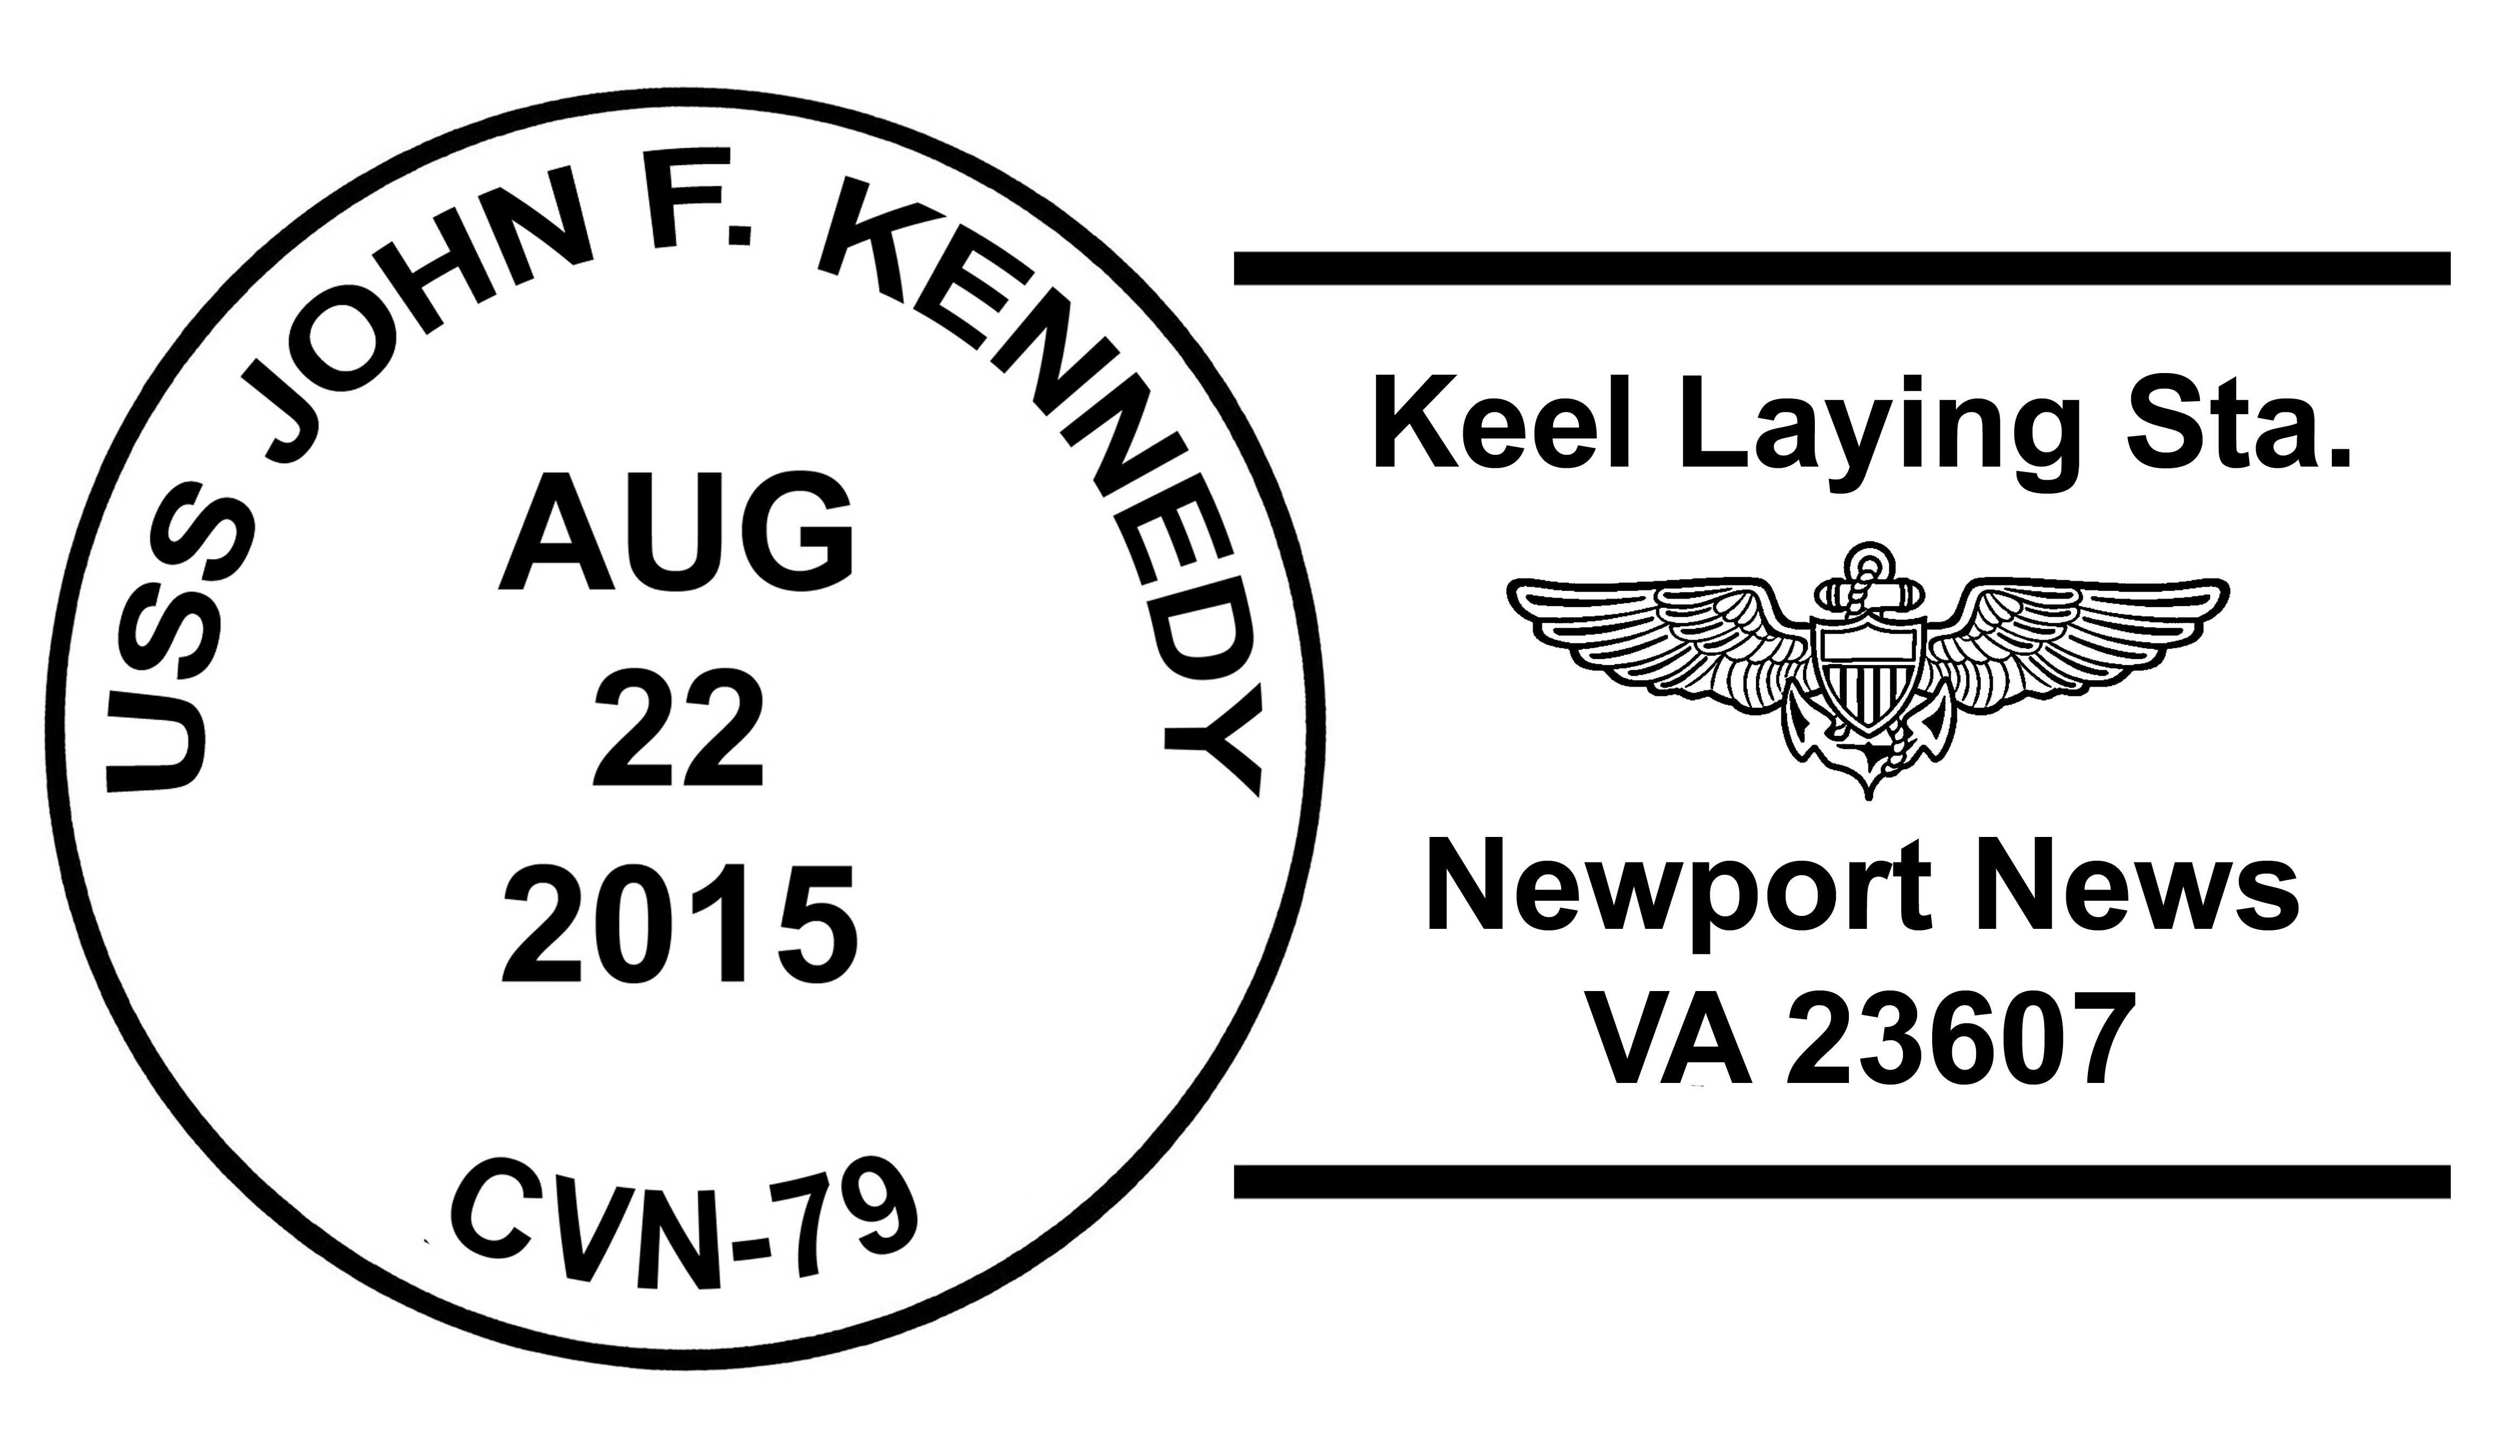 USS JOHN F. KENNEDY CVN-79 Keel Laying Sonderpoststempel Design: Wolfgang Hechler